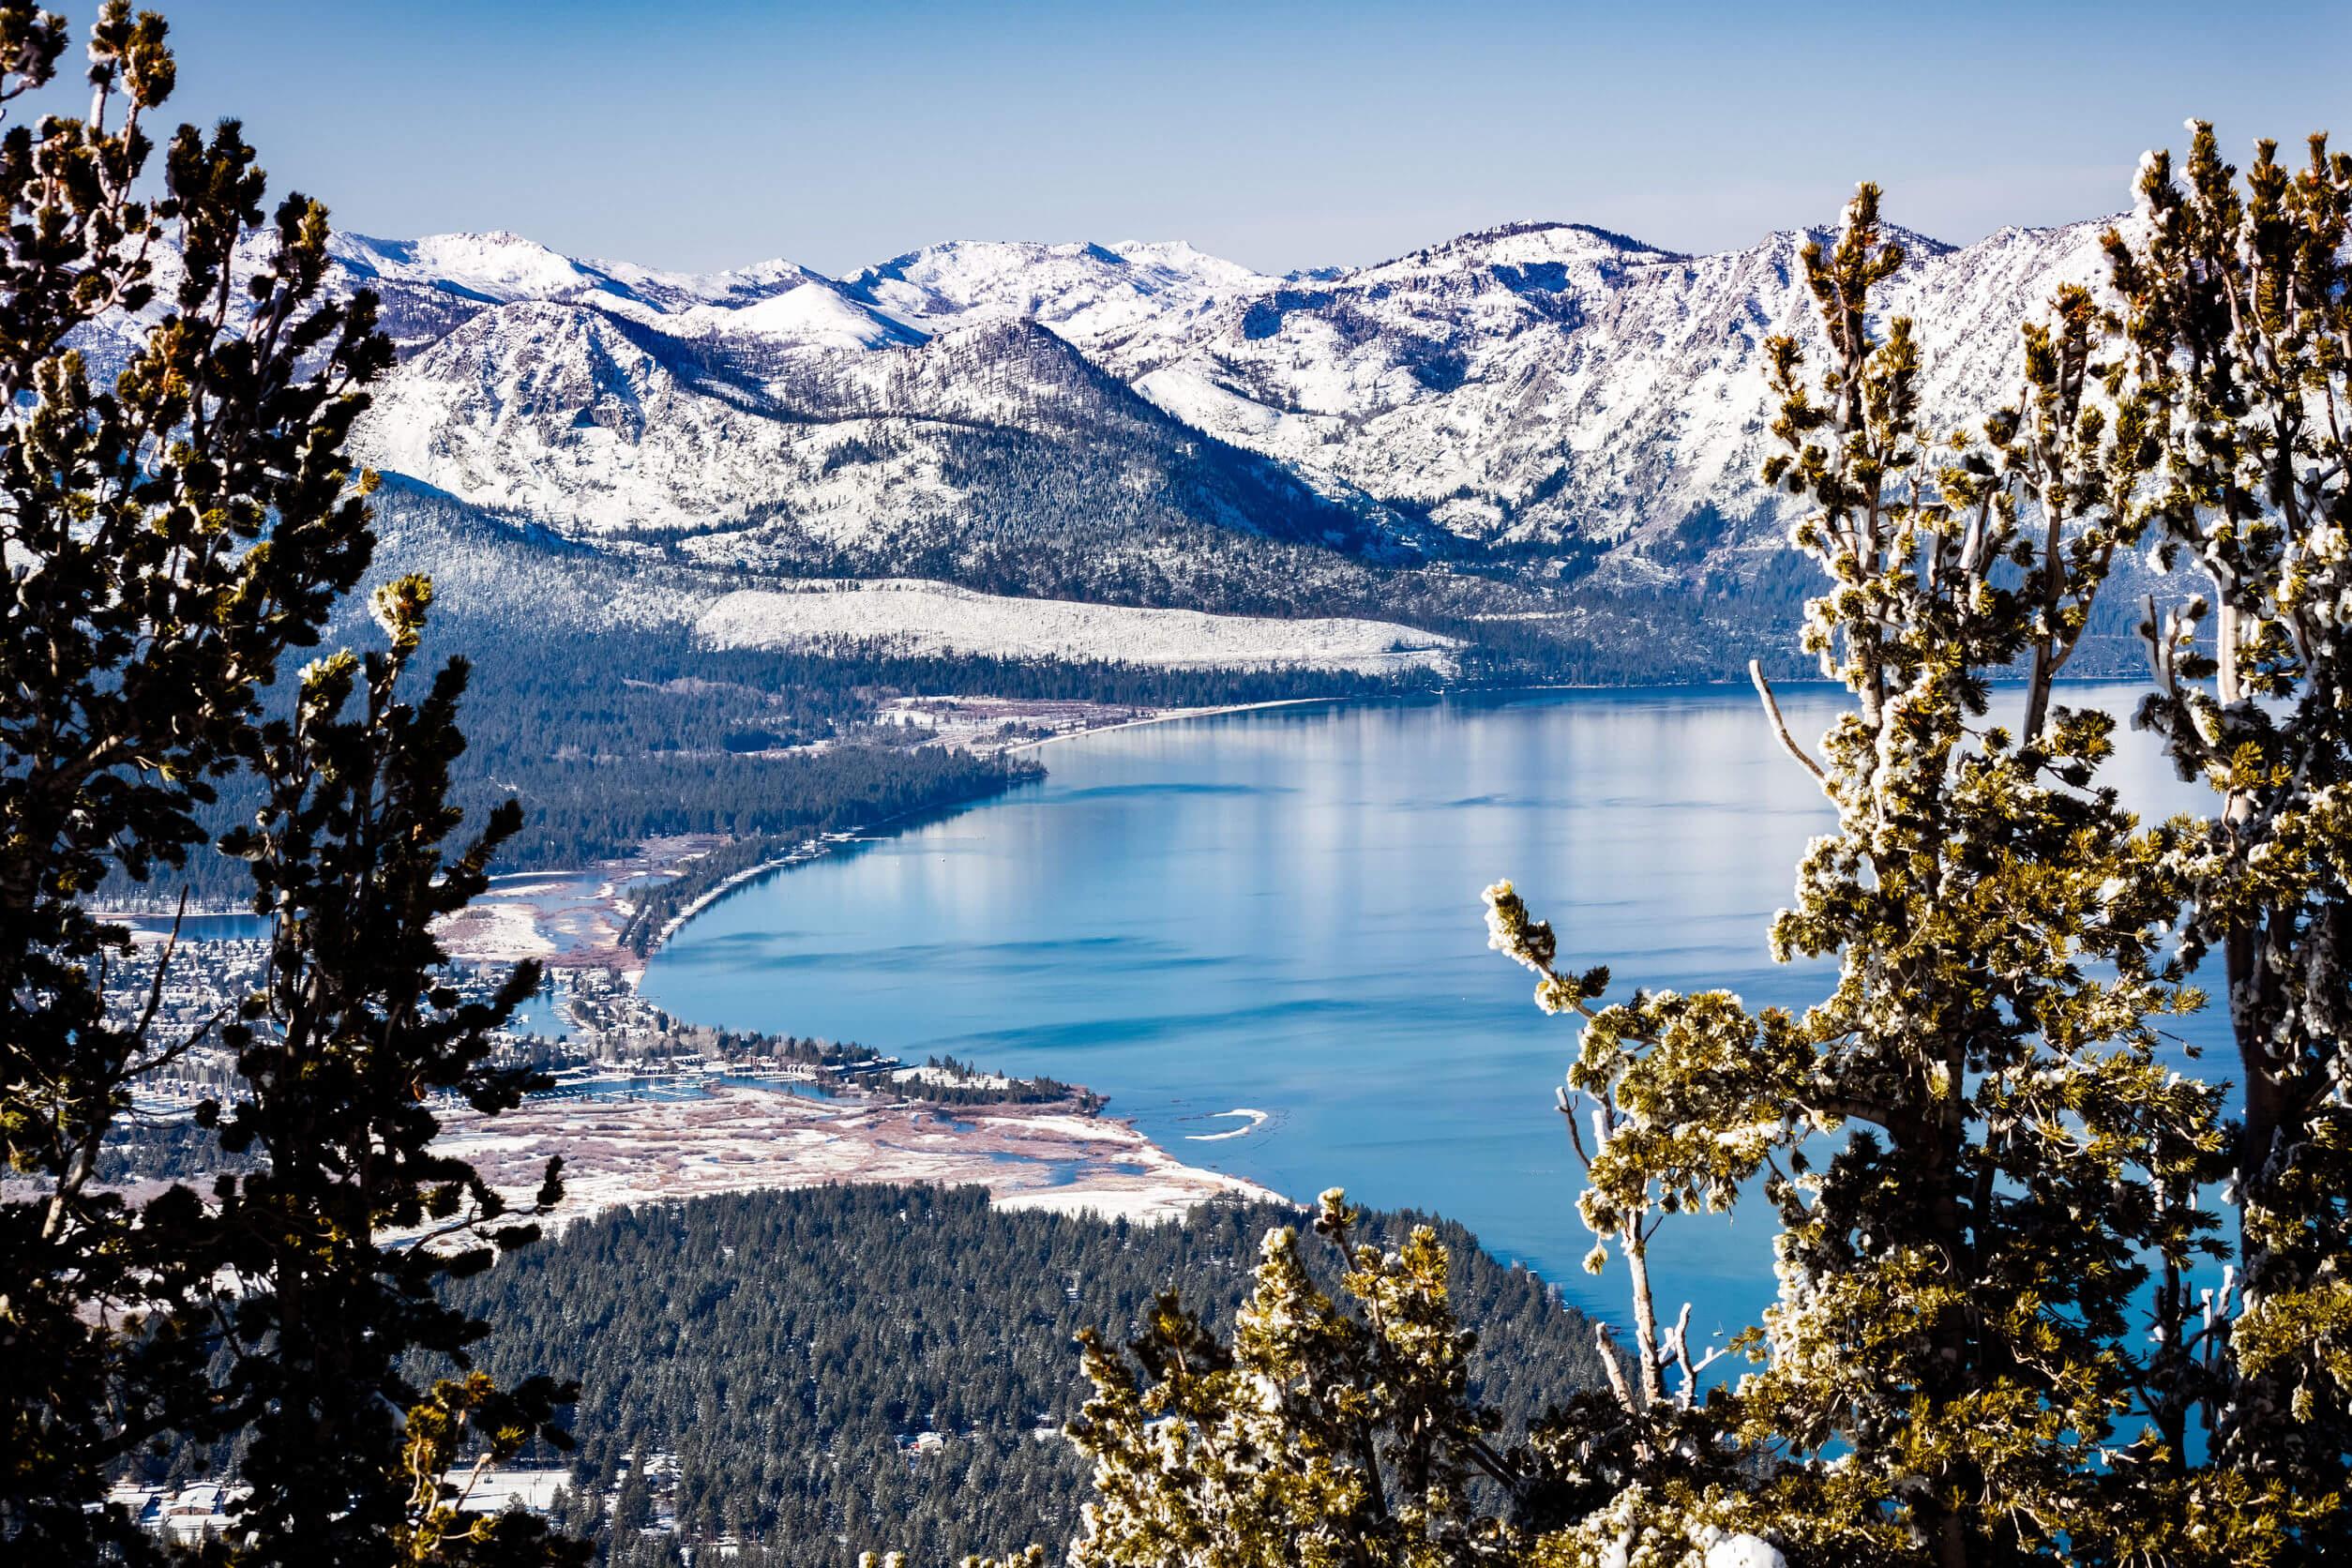 Lake Tahoe festival